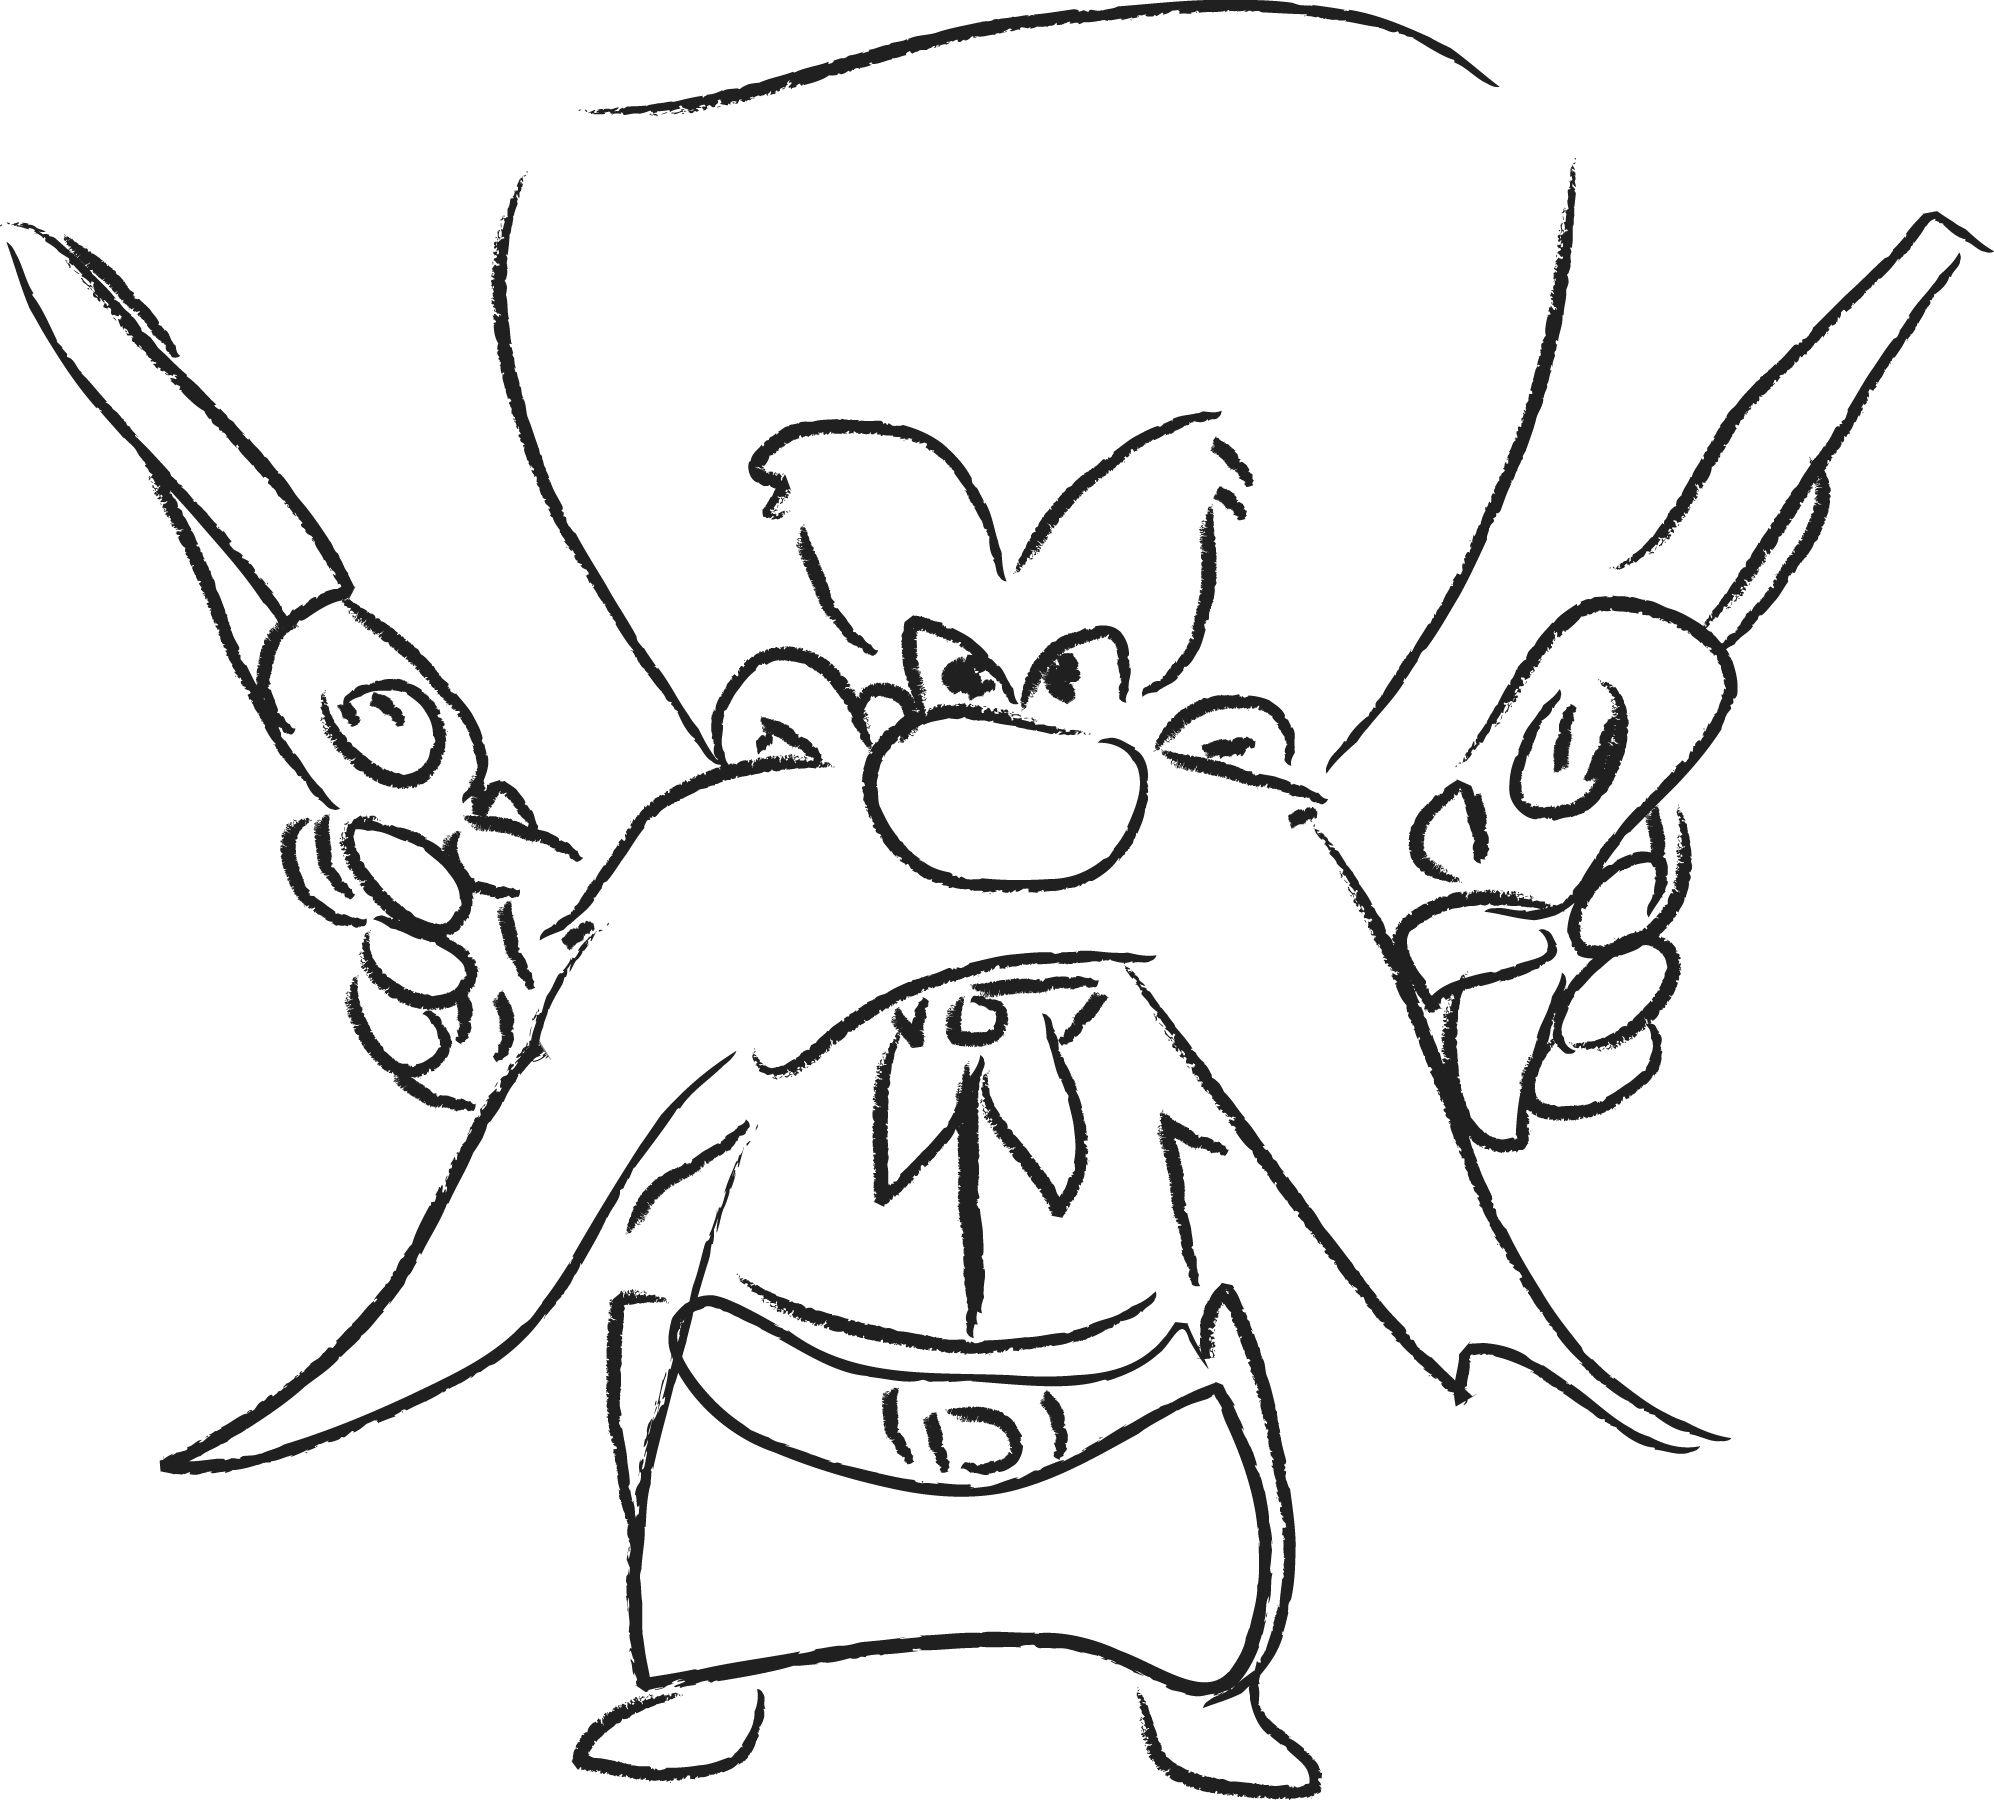 Cartoon Characters Drawings : Psd drawings drawing cartoon characters